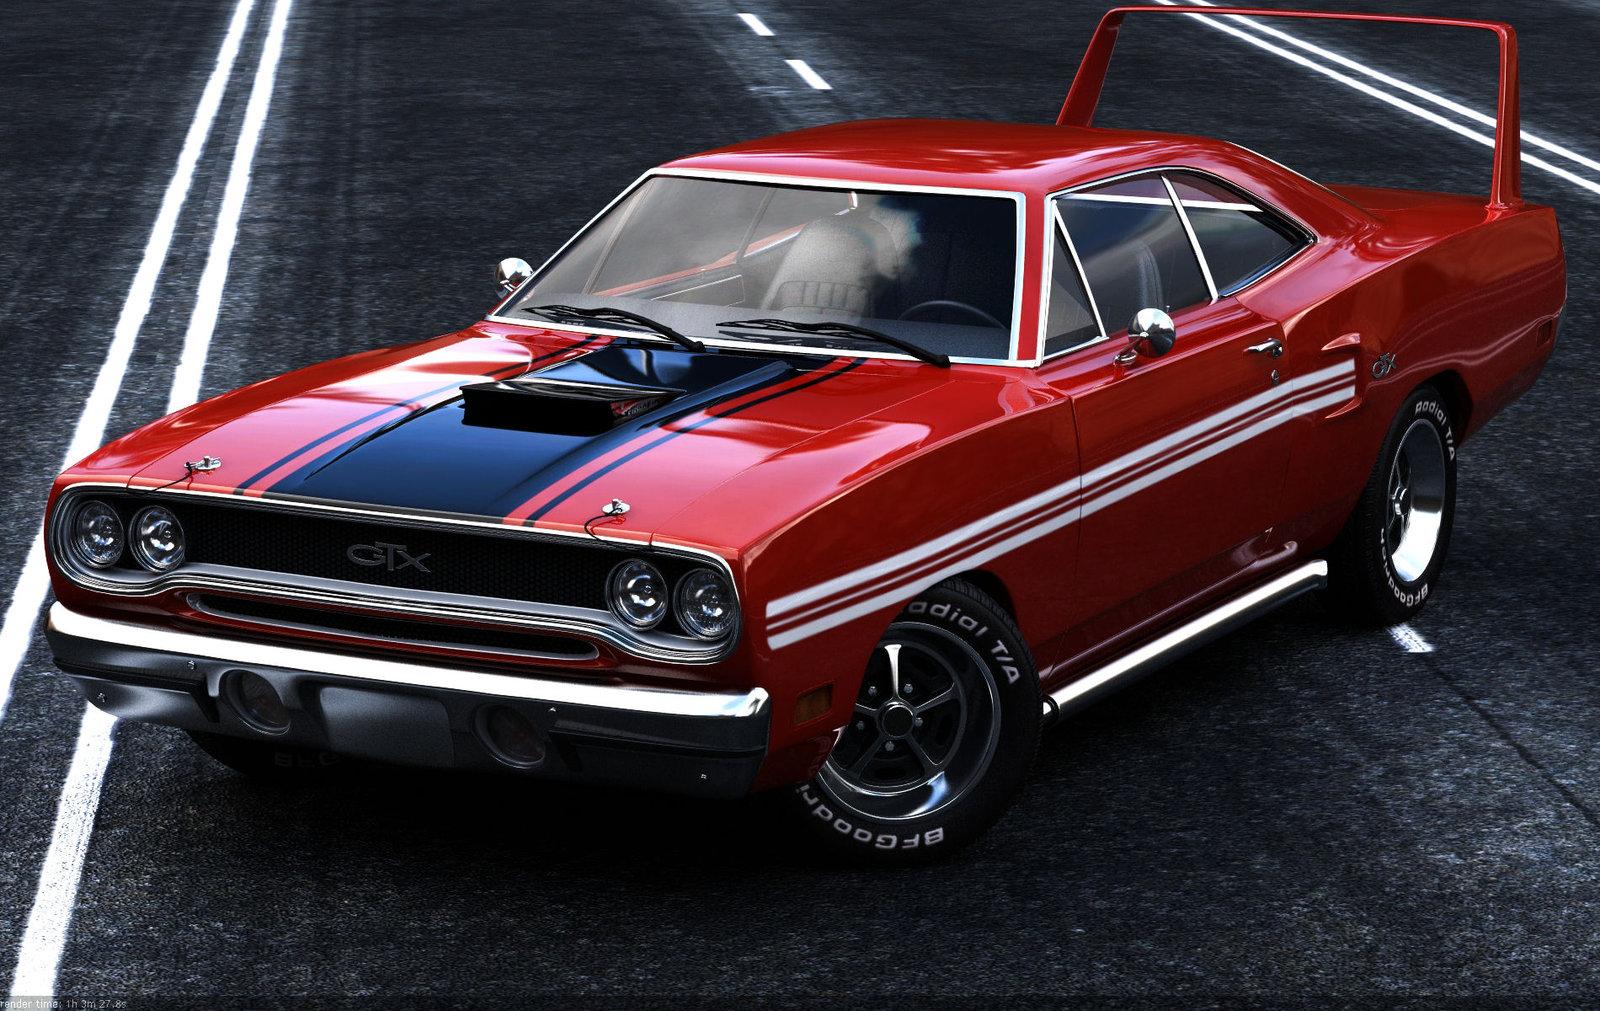 musclecars !us muscle cars !us muscle car !muscle american cars ...